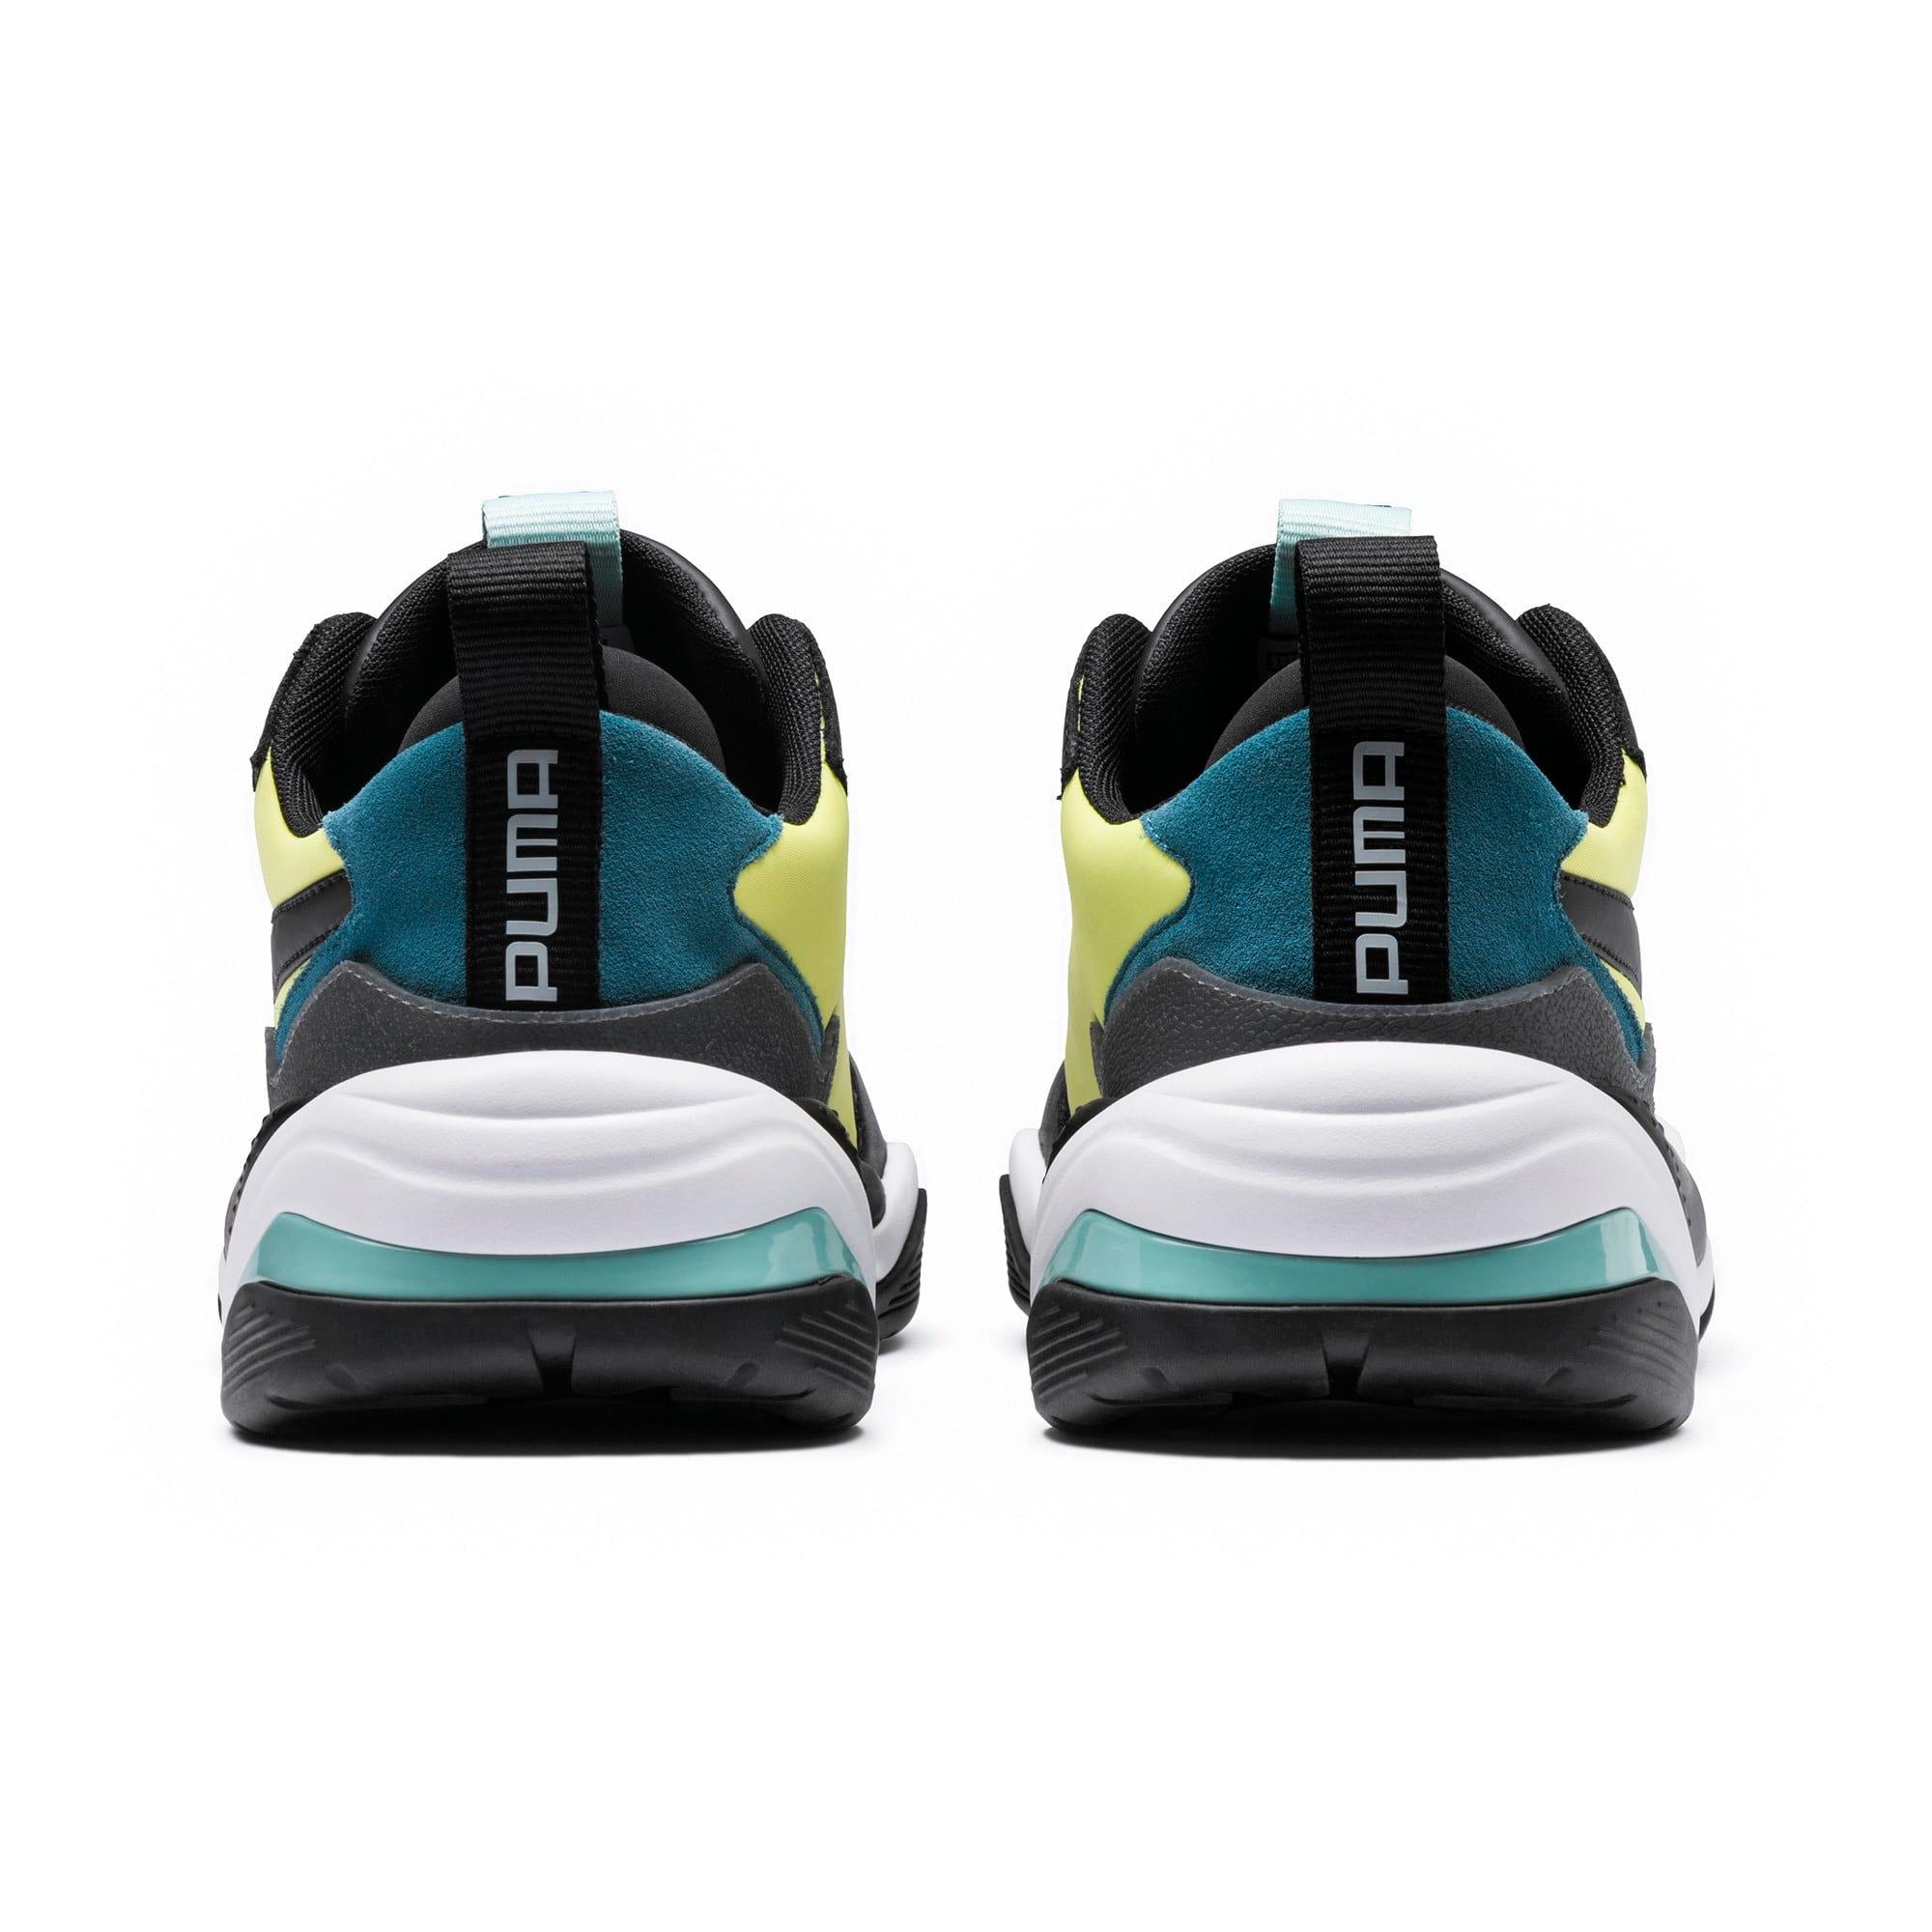 Thumbnail 4 of Sneakers Thunder Spectra, Puma Blk-Puma Blk-Puma White, medium